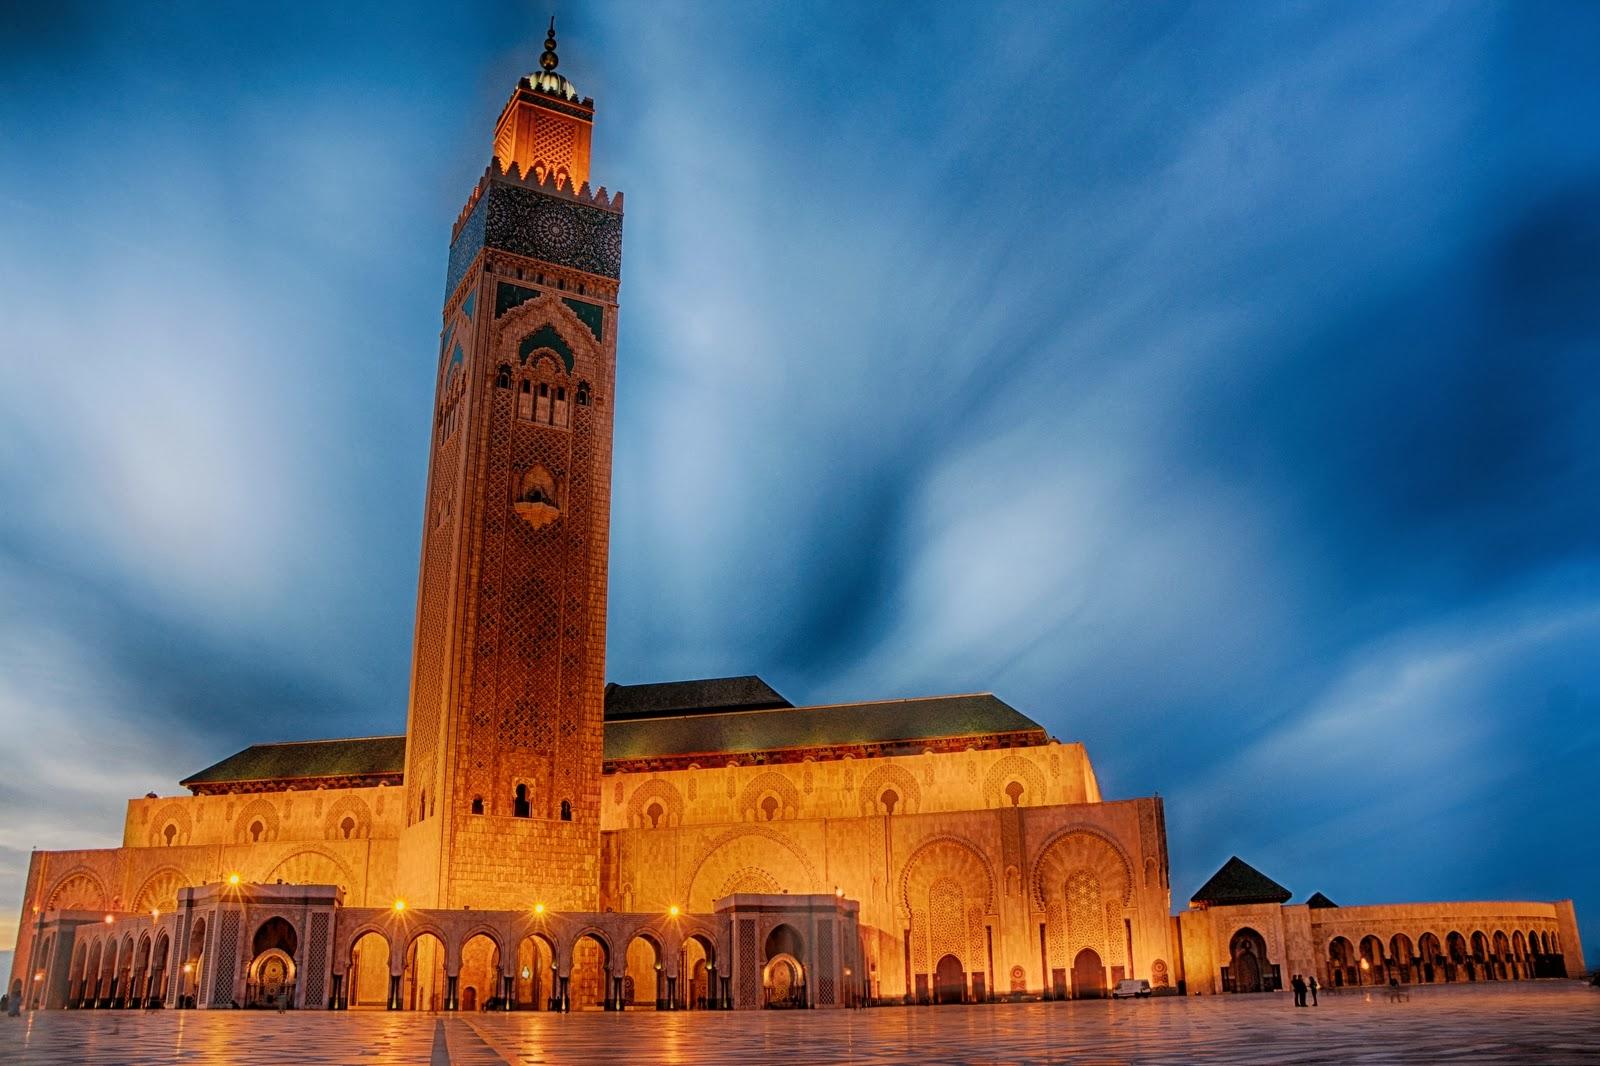 Fotografía del exterior de la mezquita de Hassan II, Casablanca, Marruecos